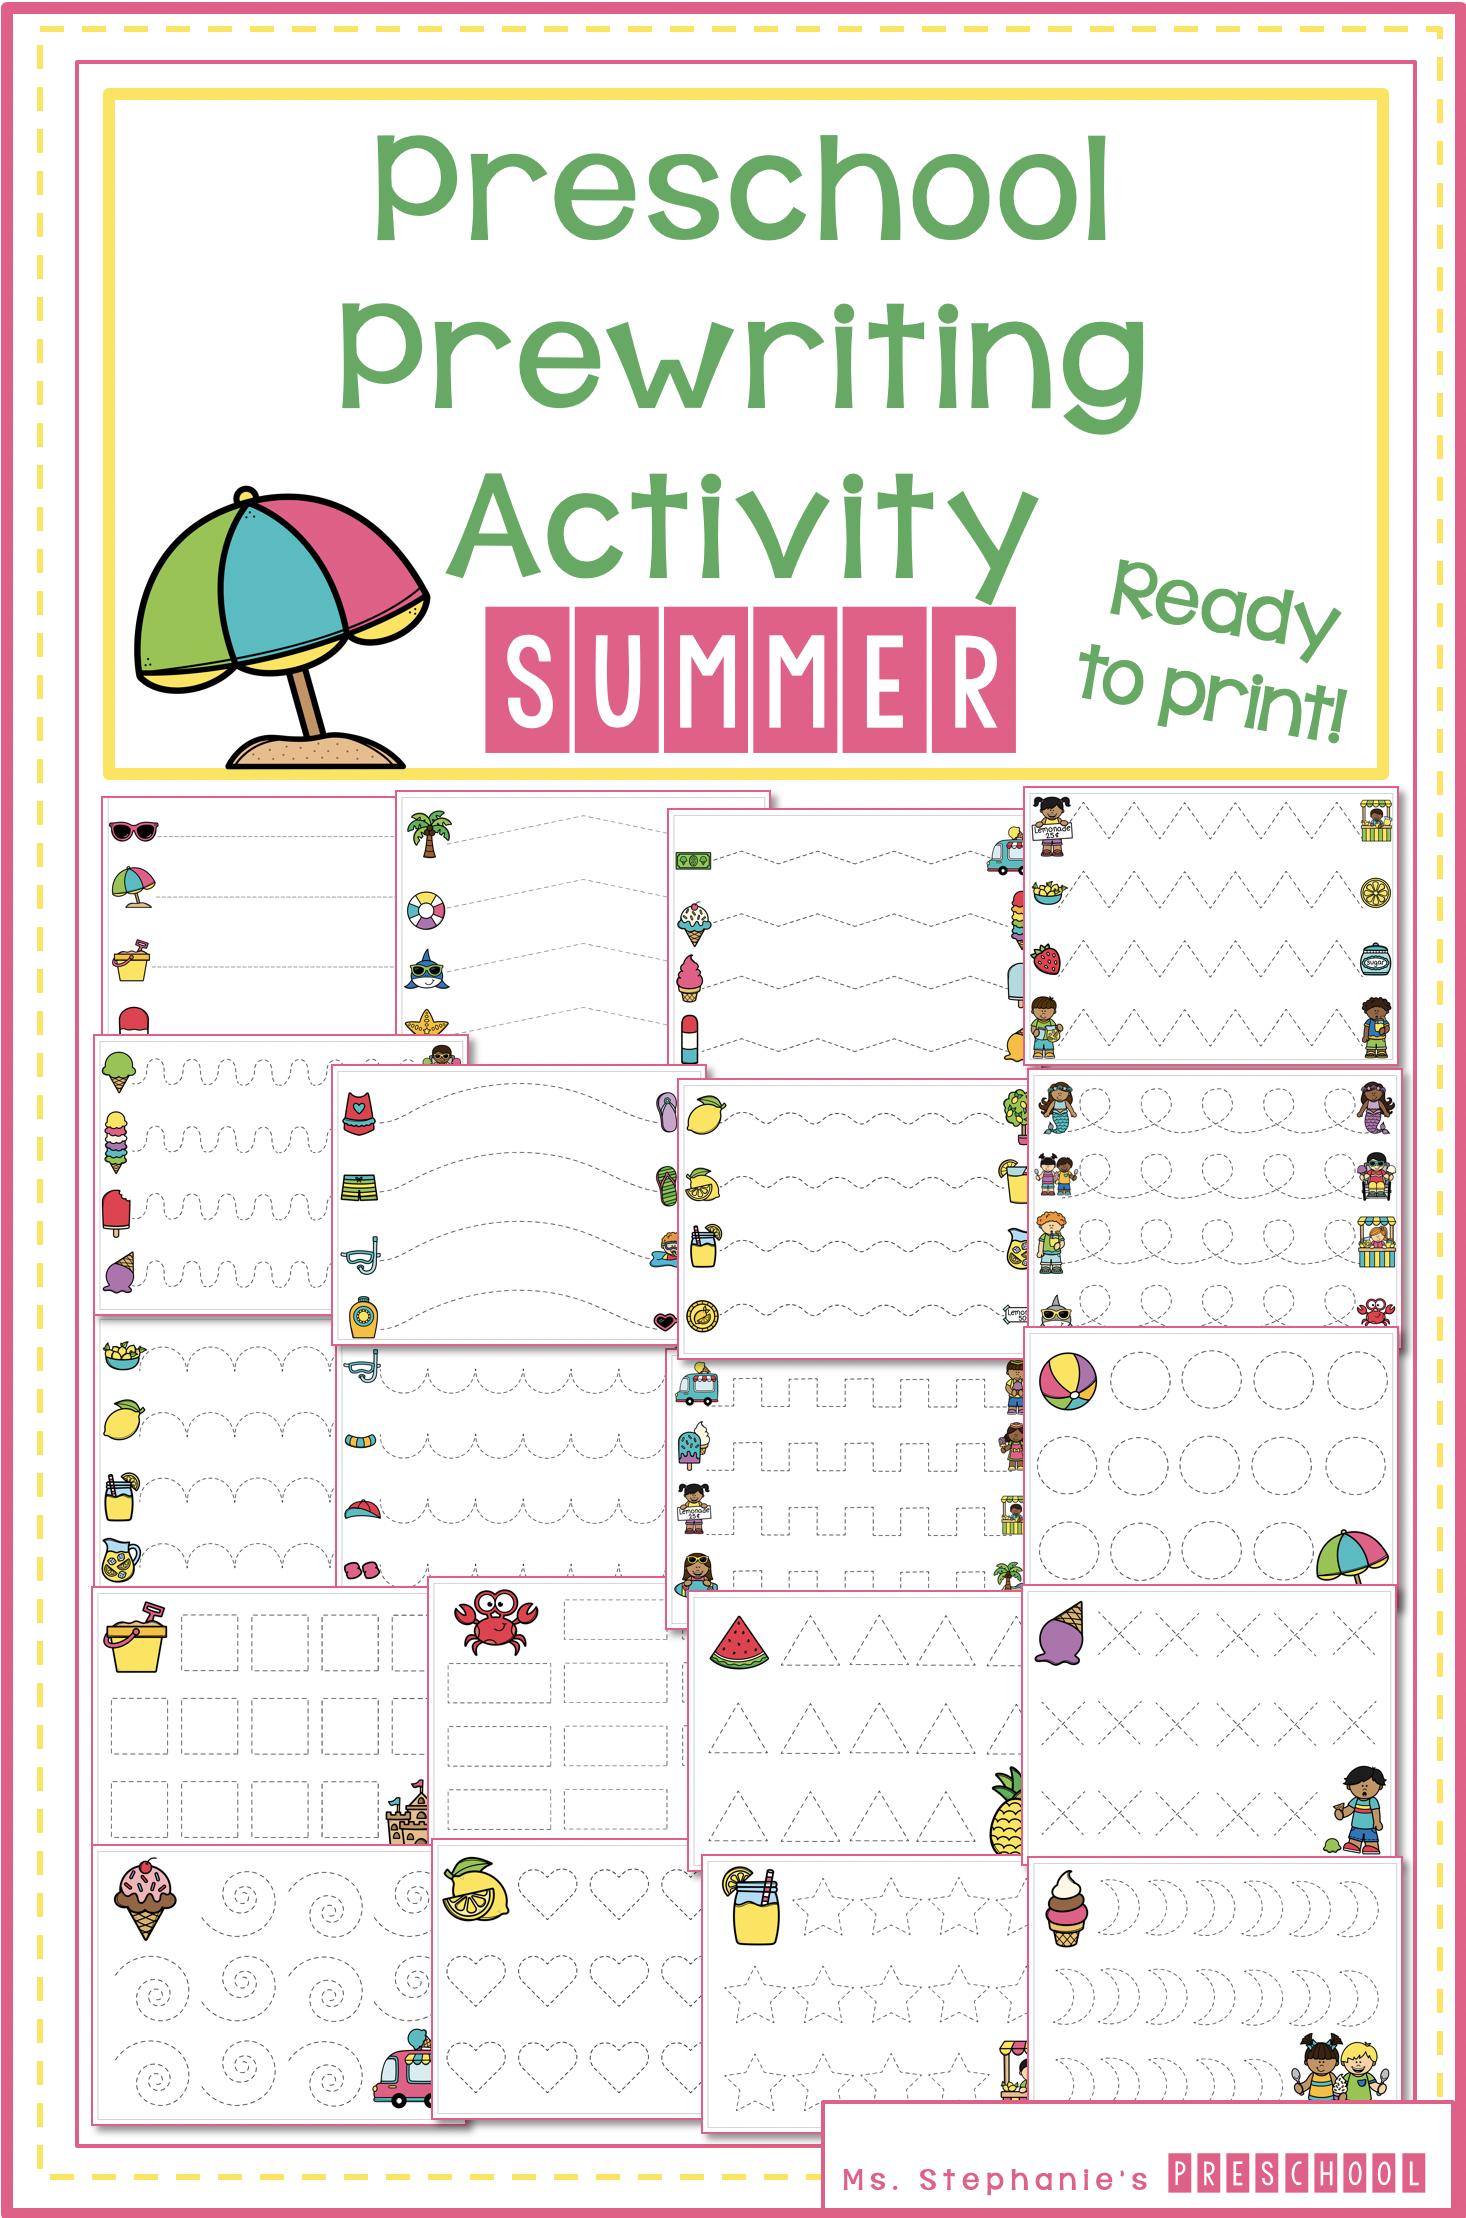 Prewriting Activity Summer Preschool Tracing Worksheets In